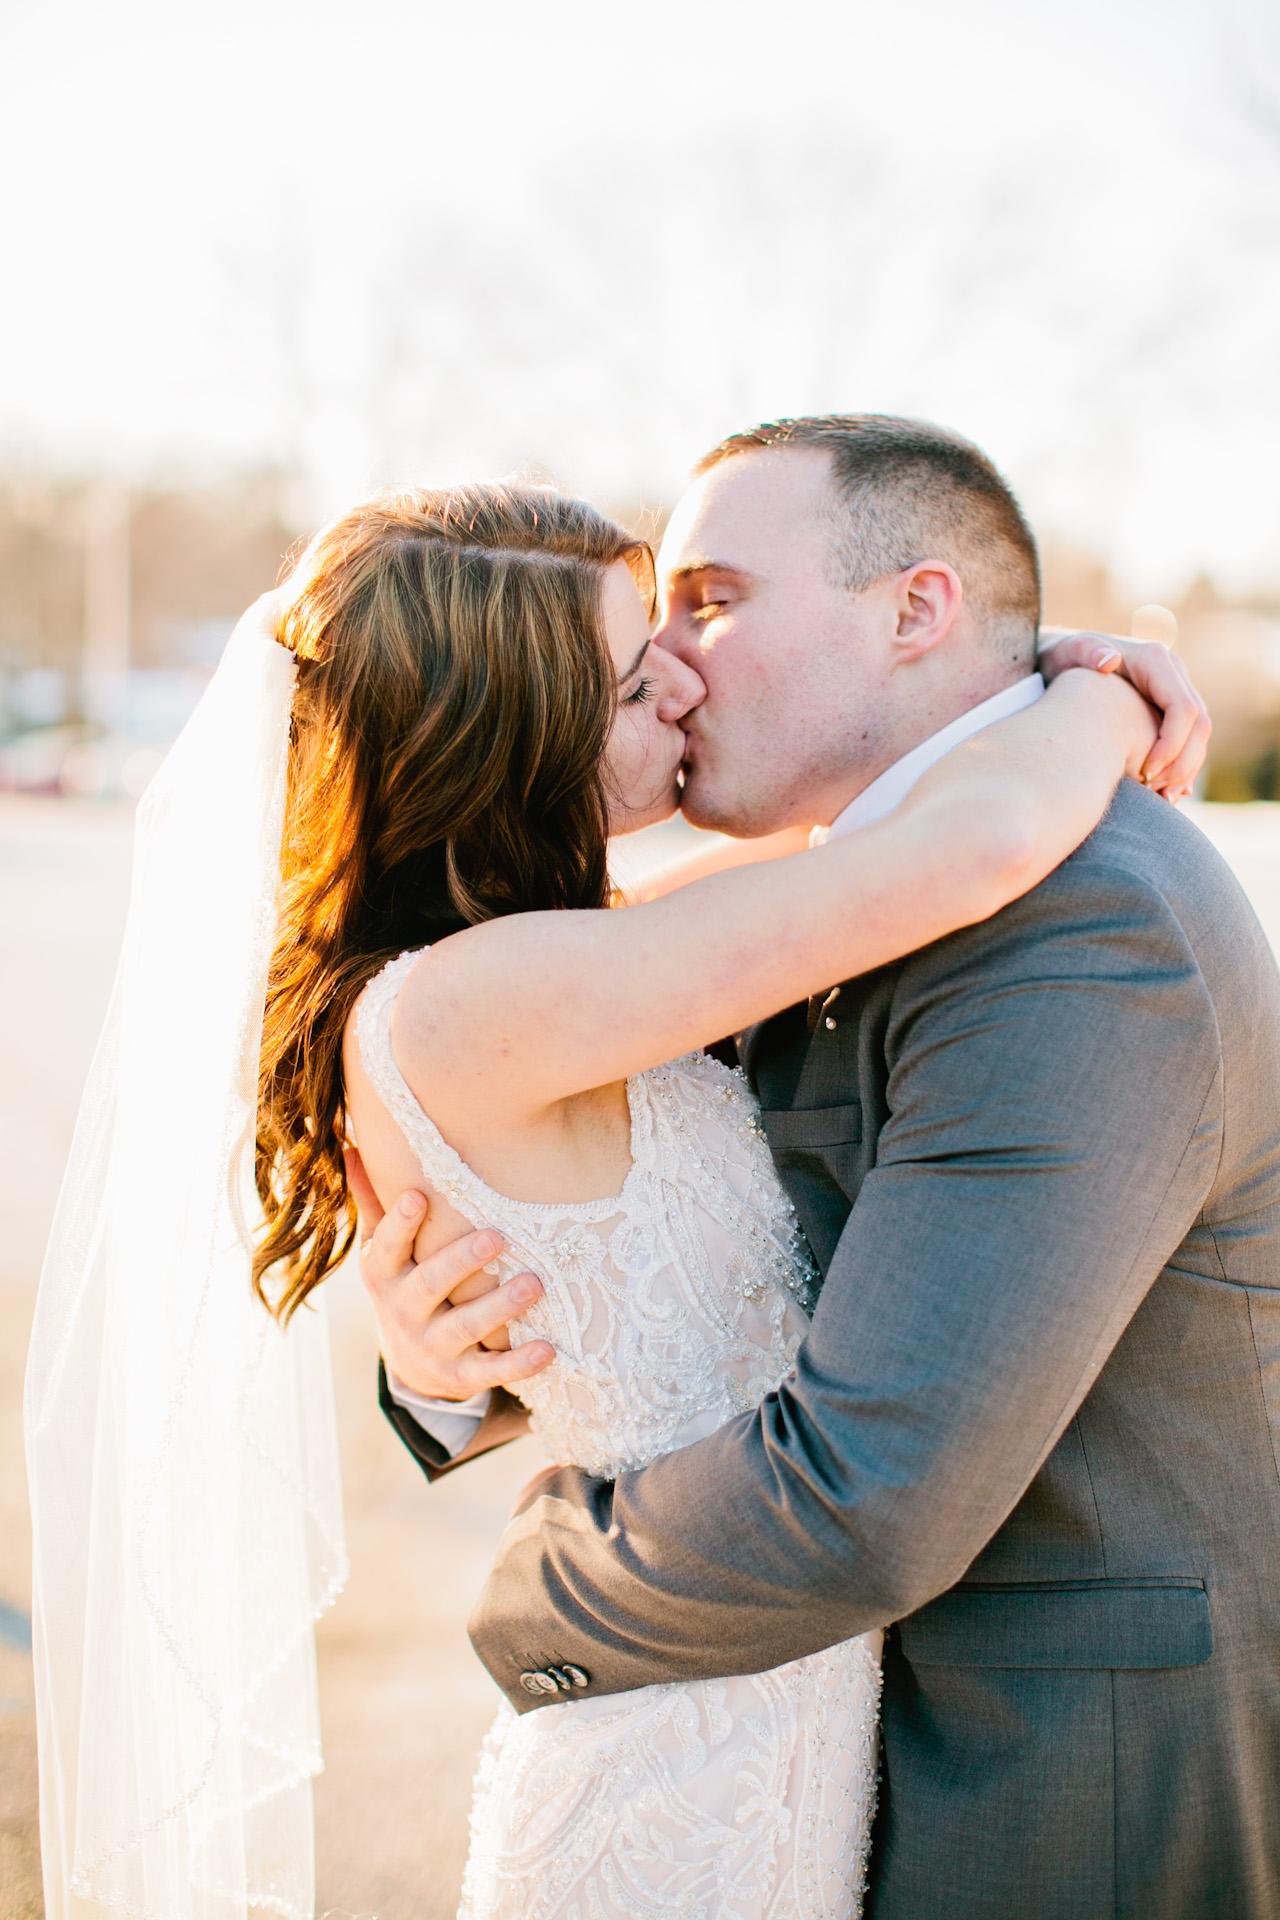 golden-hour-wedding-photos in parking lot